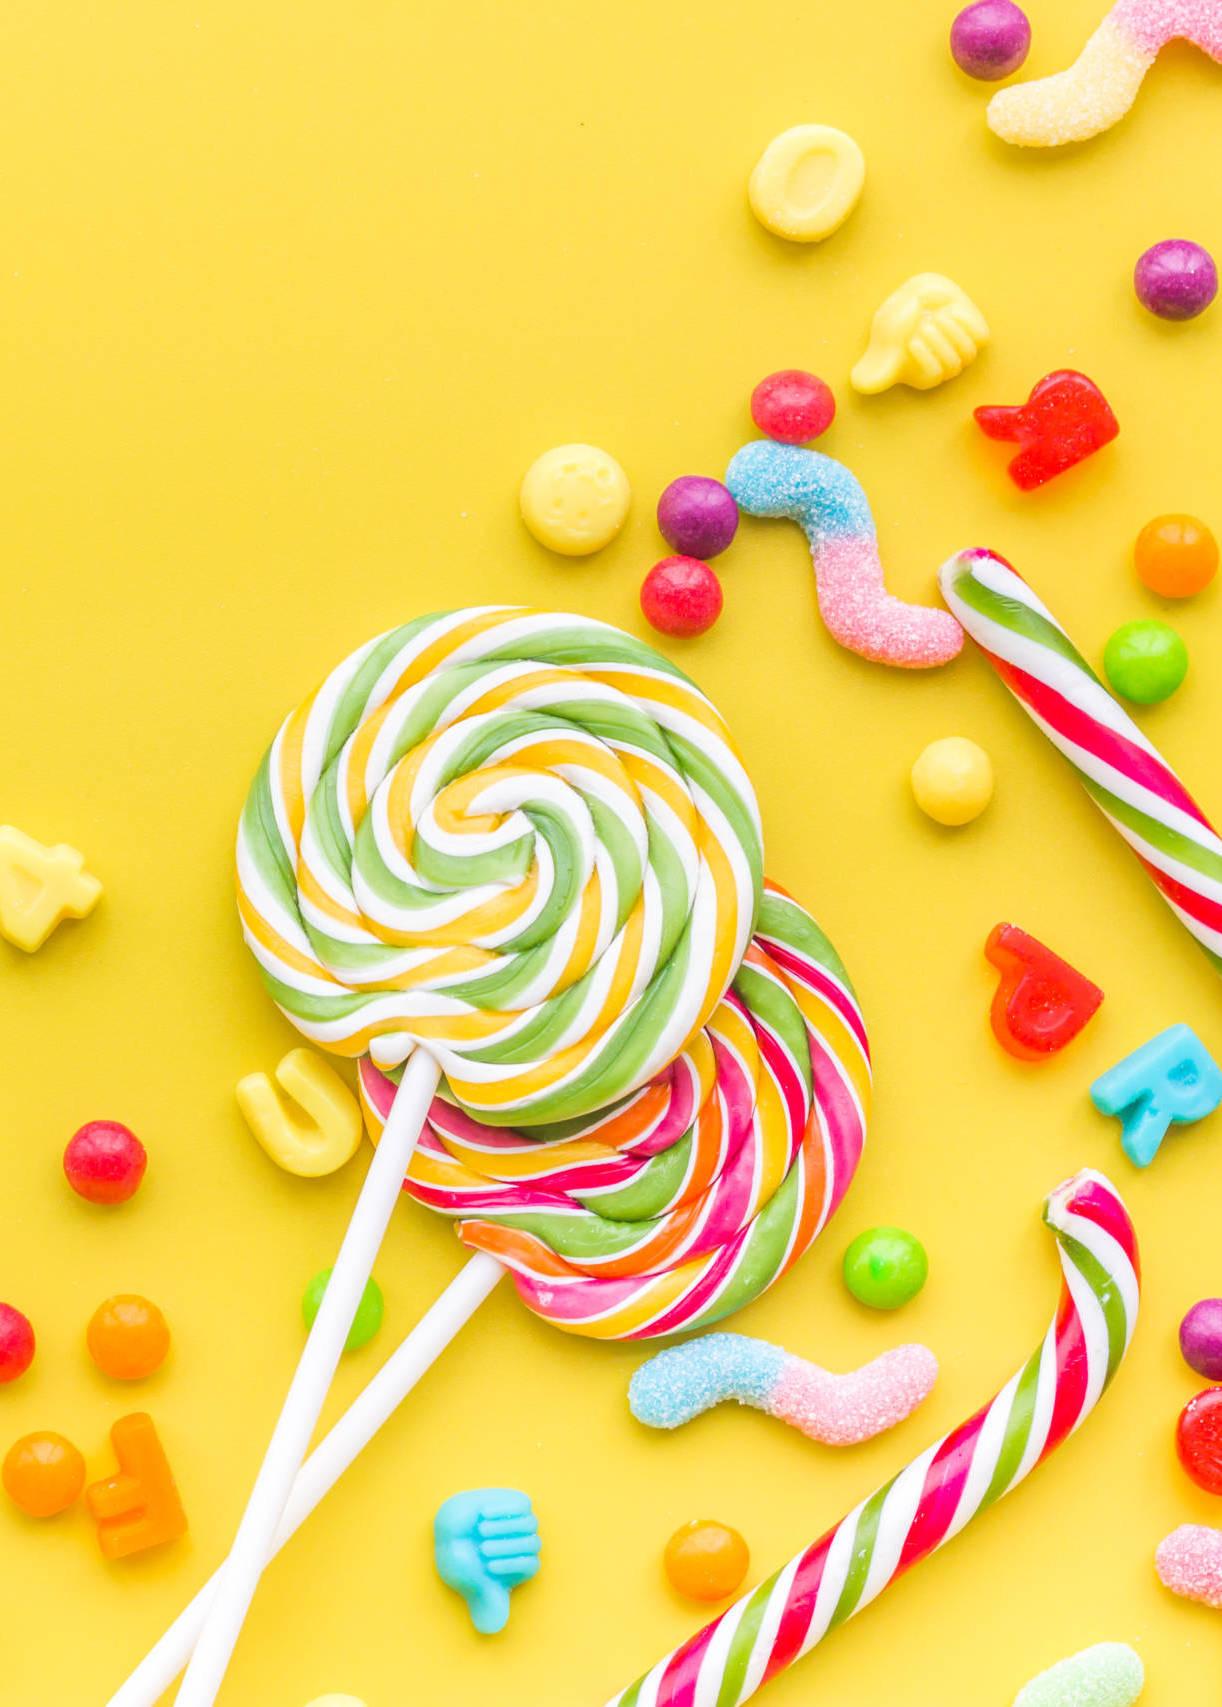 candy shop online